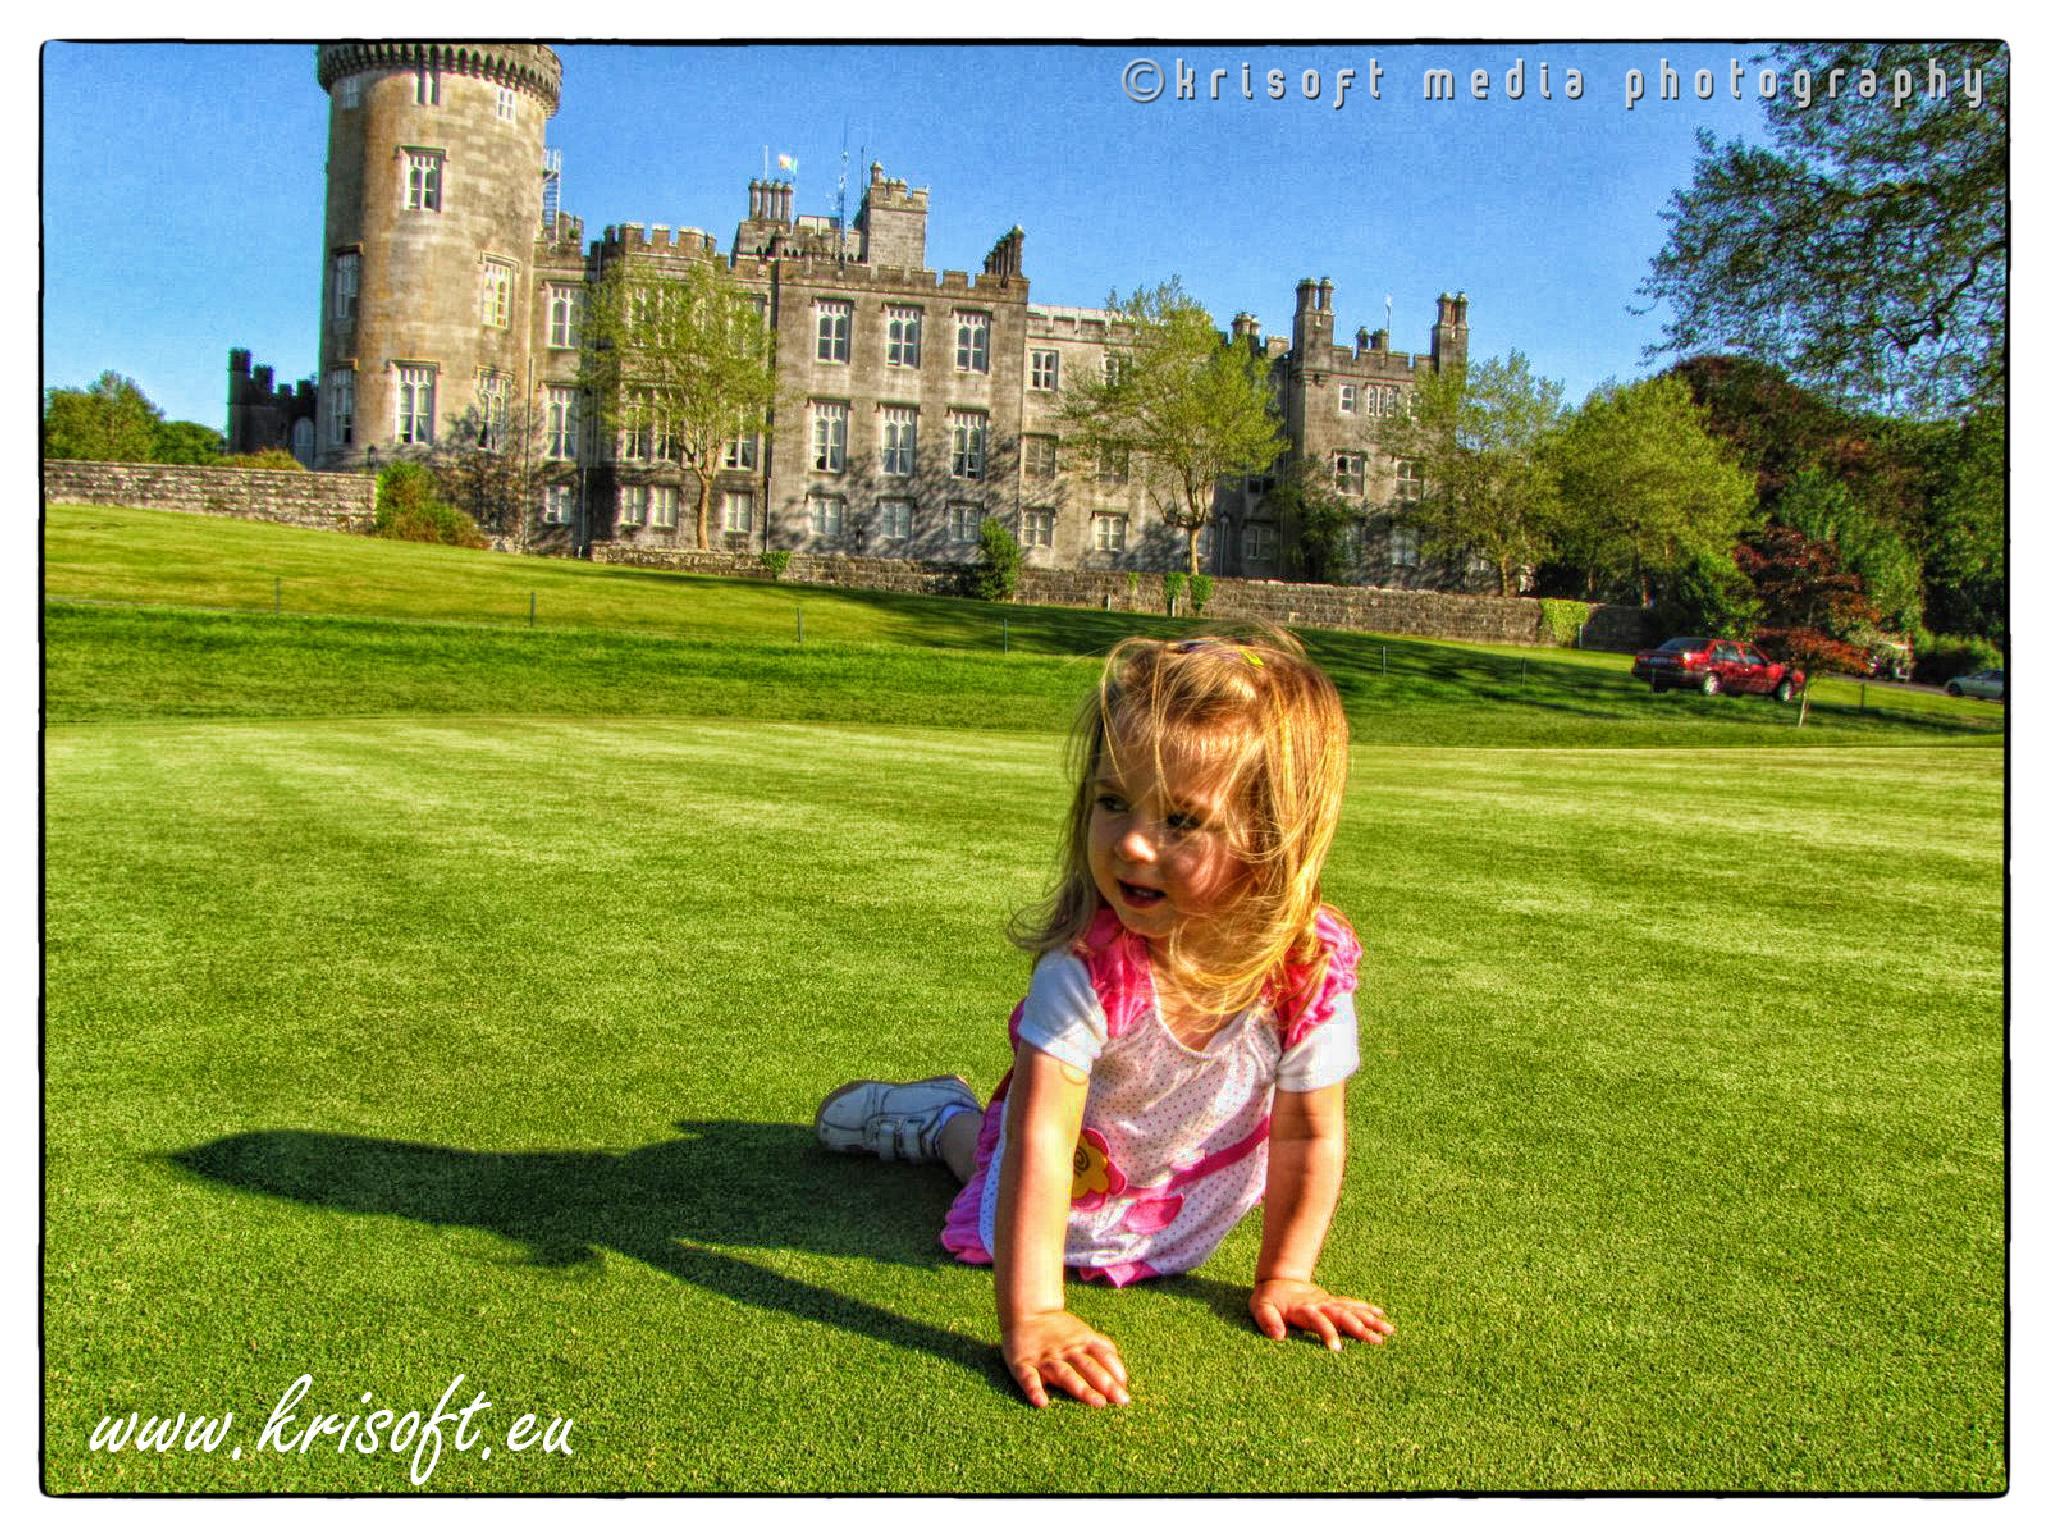 Julia at golf club in Dromoland Castle by Krzysztof Luszczki